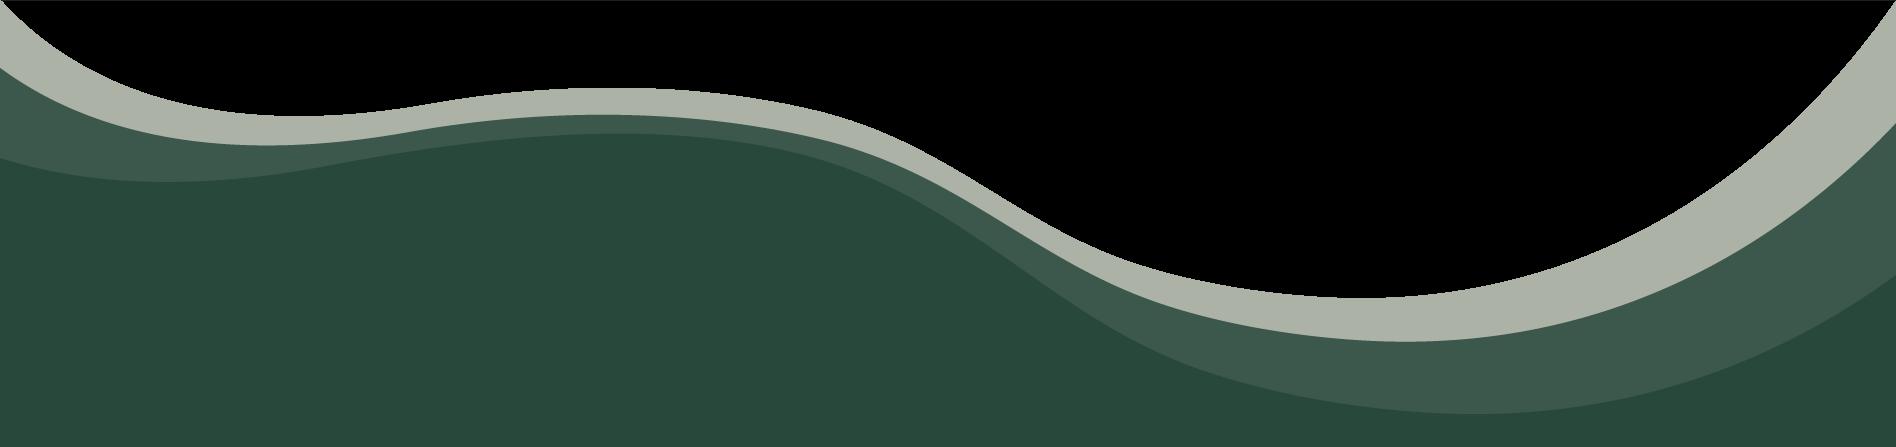 Separator